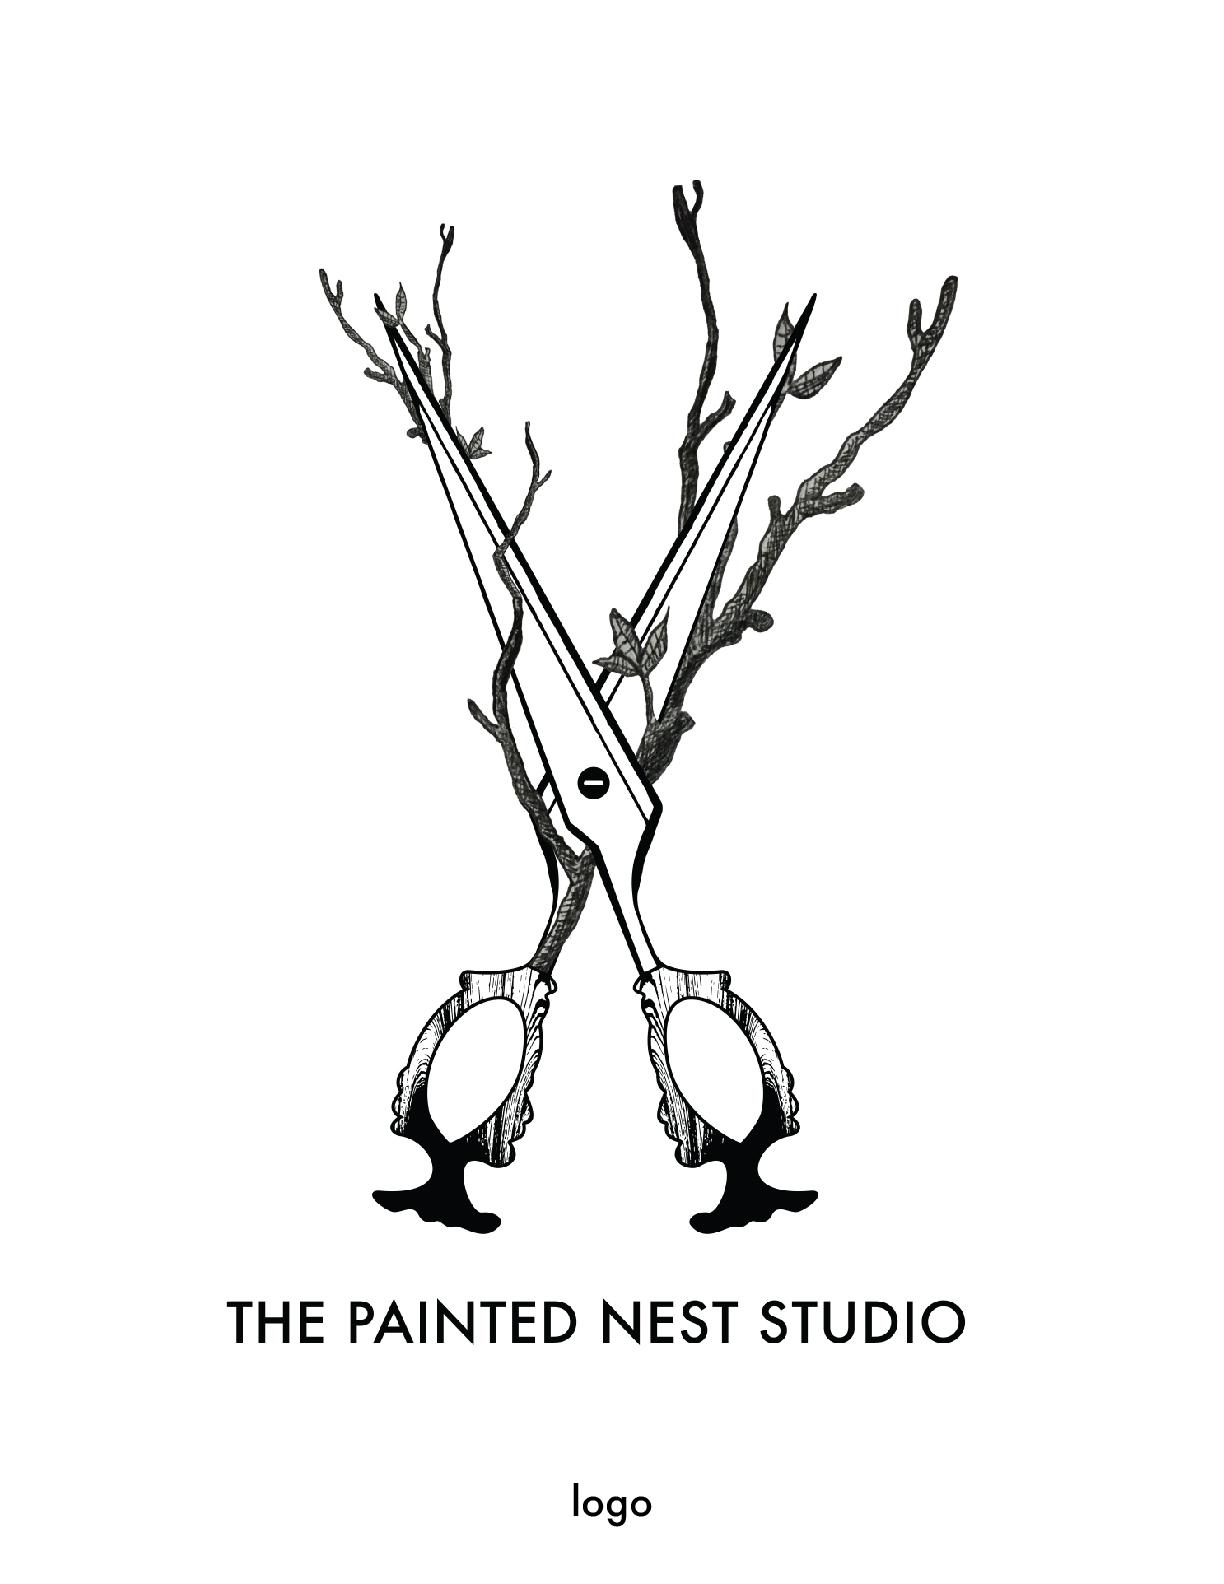 the painted nest studio logo